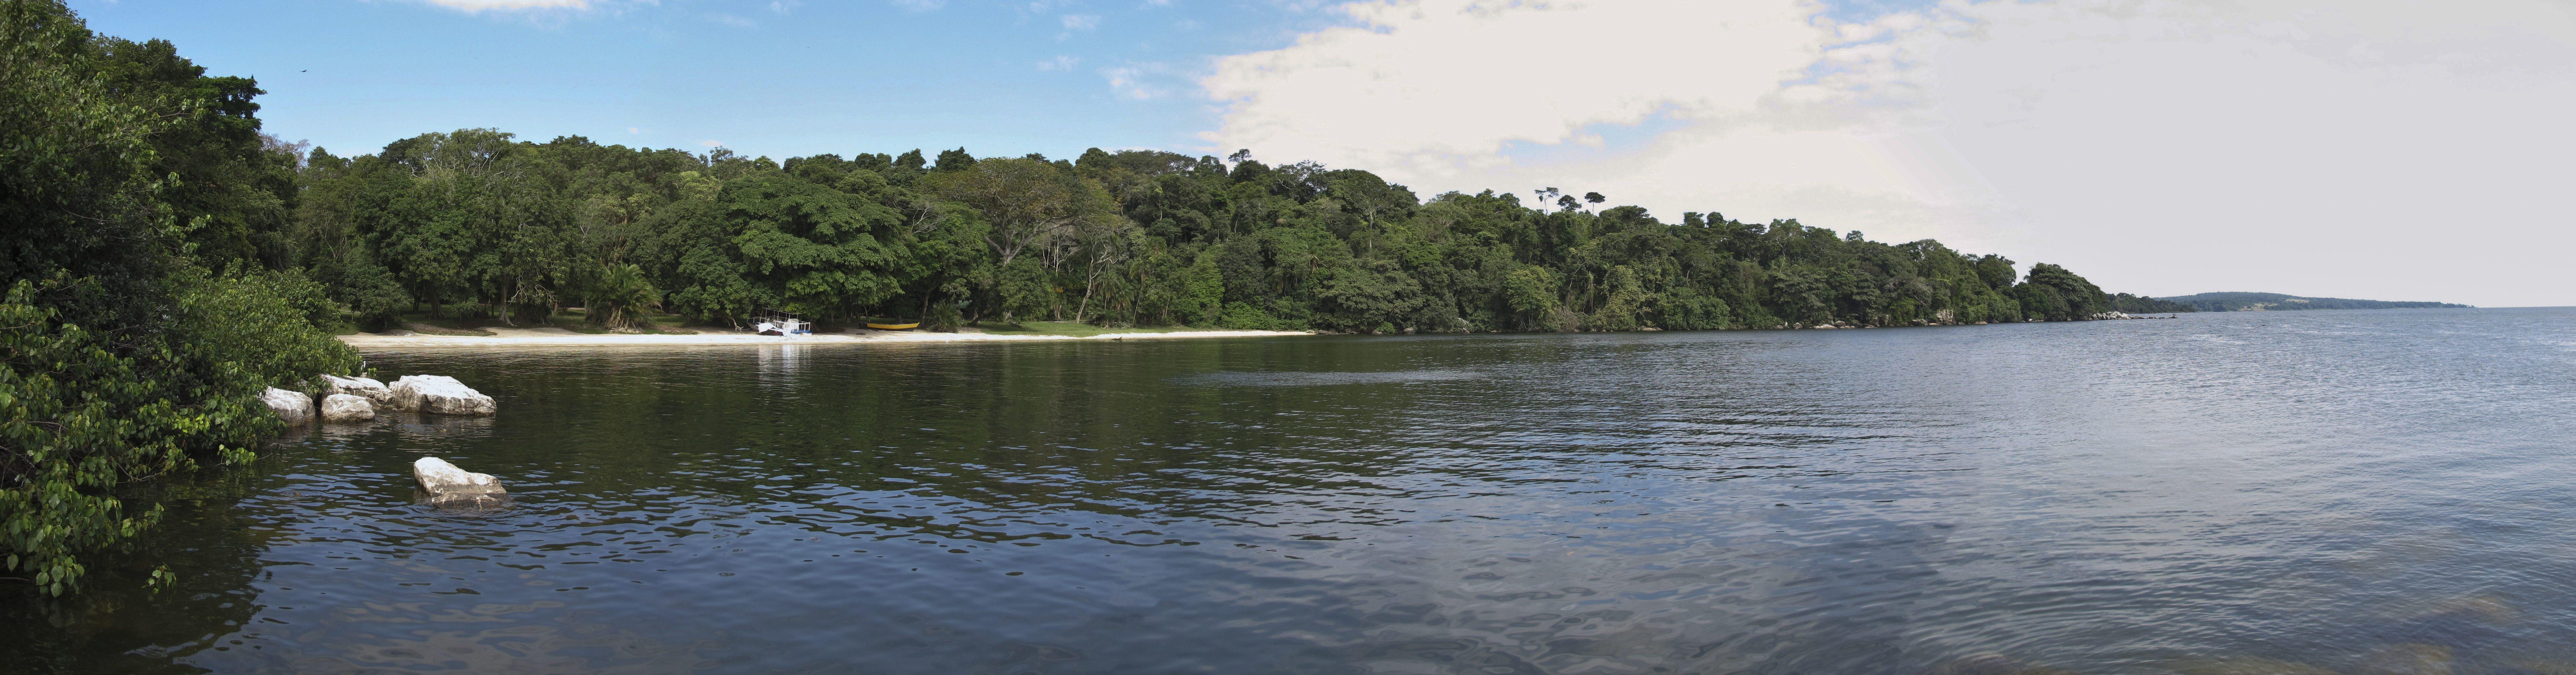 Rubondo-Island-camp-beach-forest-view